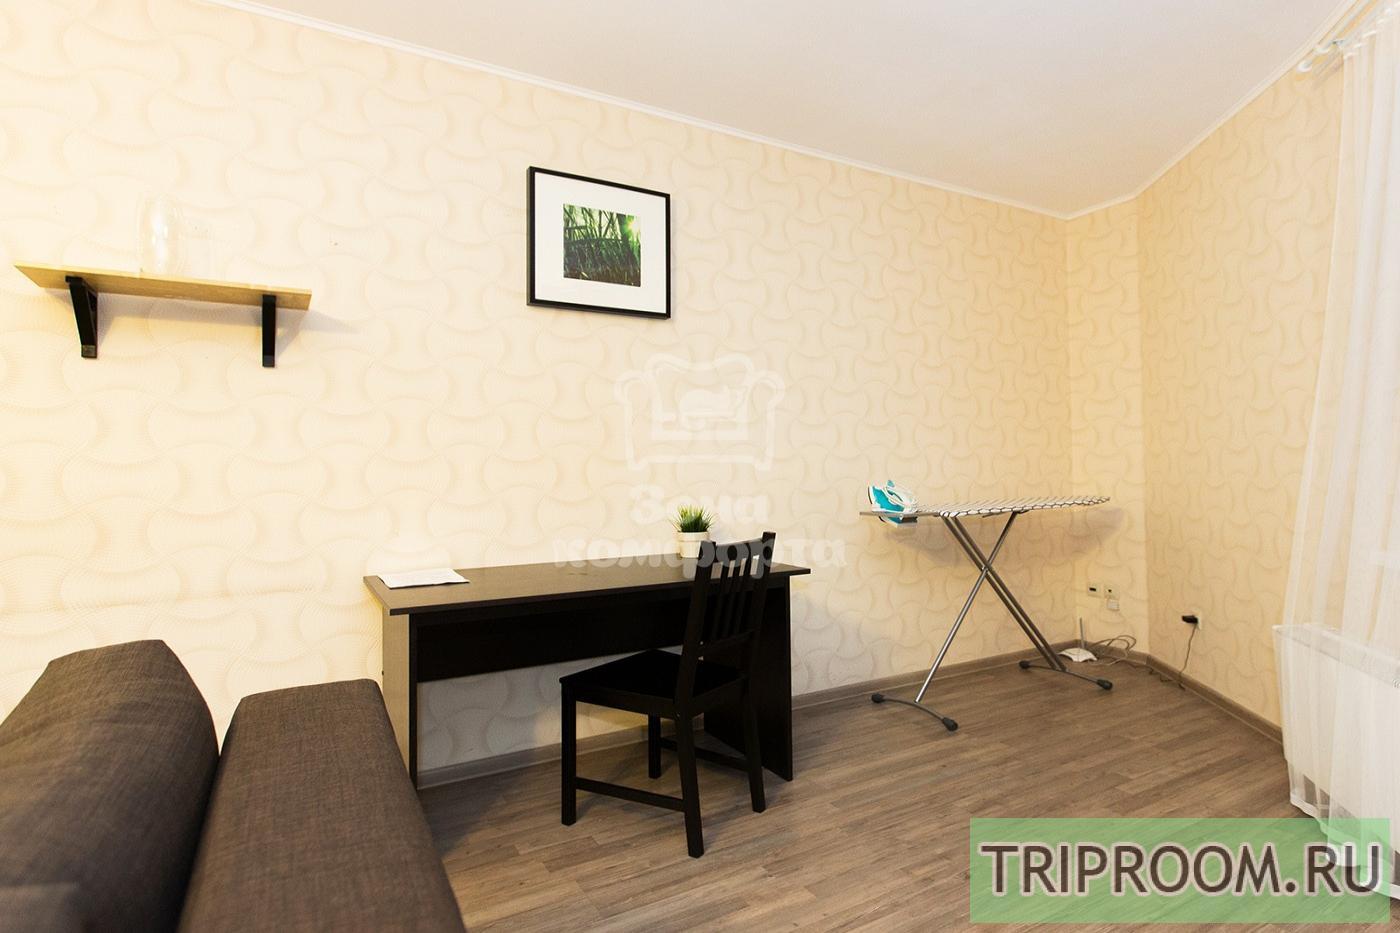 2-комнатная квартира посуточно (вариант № 34715), ул. Гагарина бульвар, фото № 18